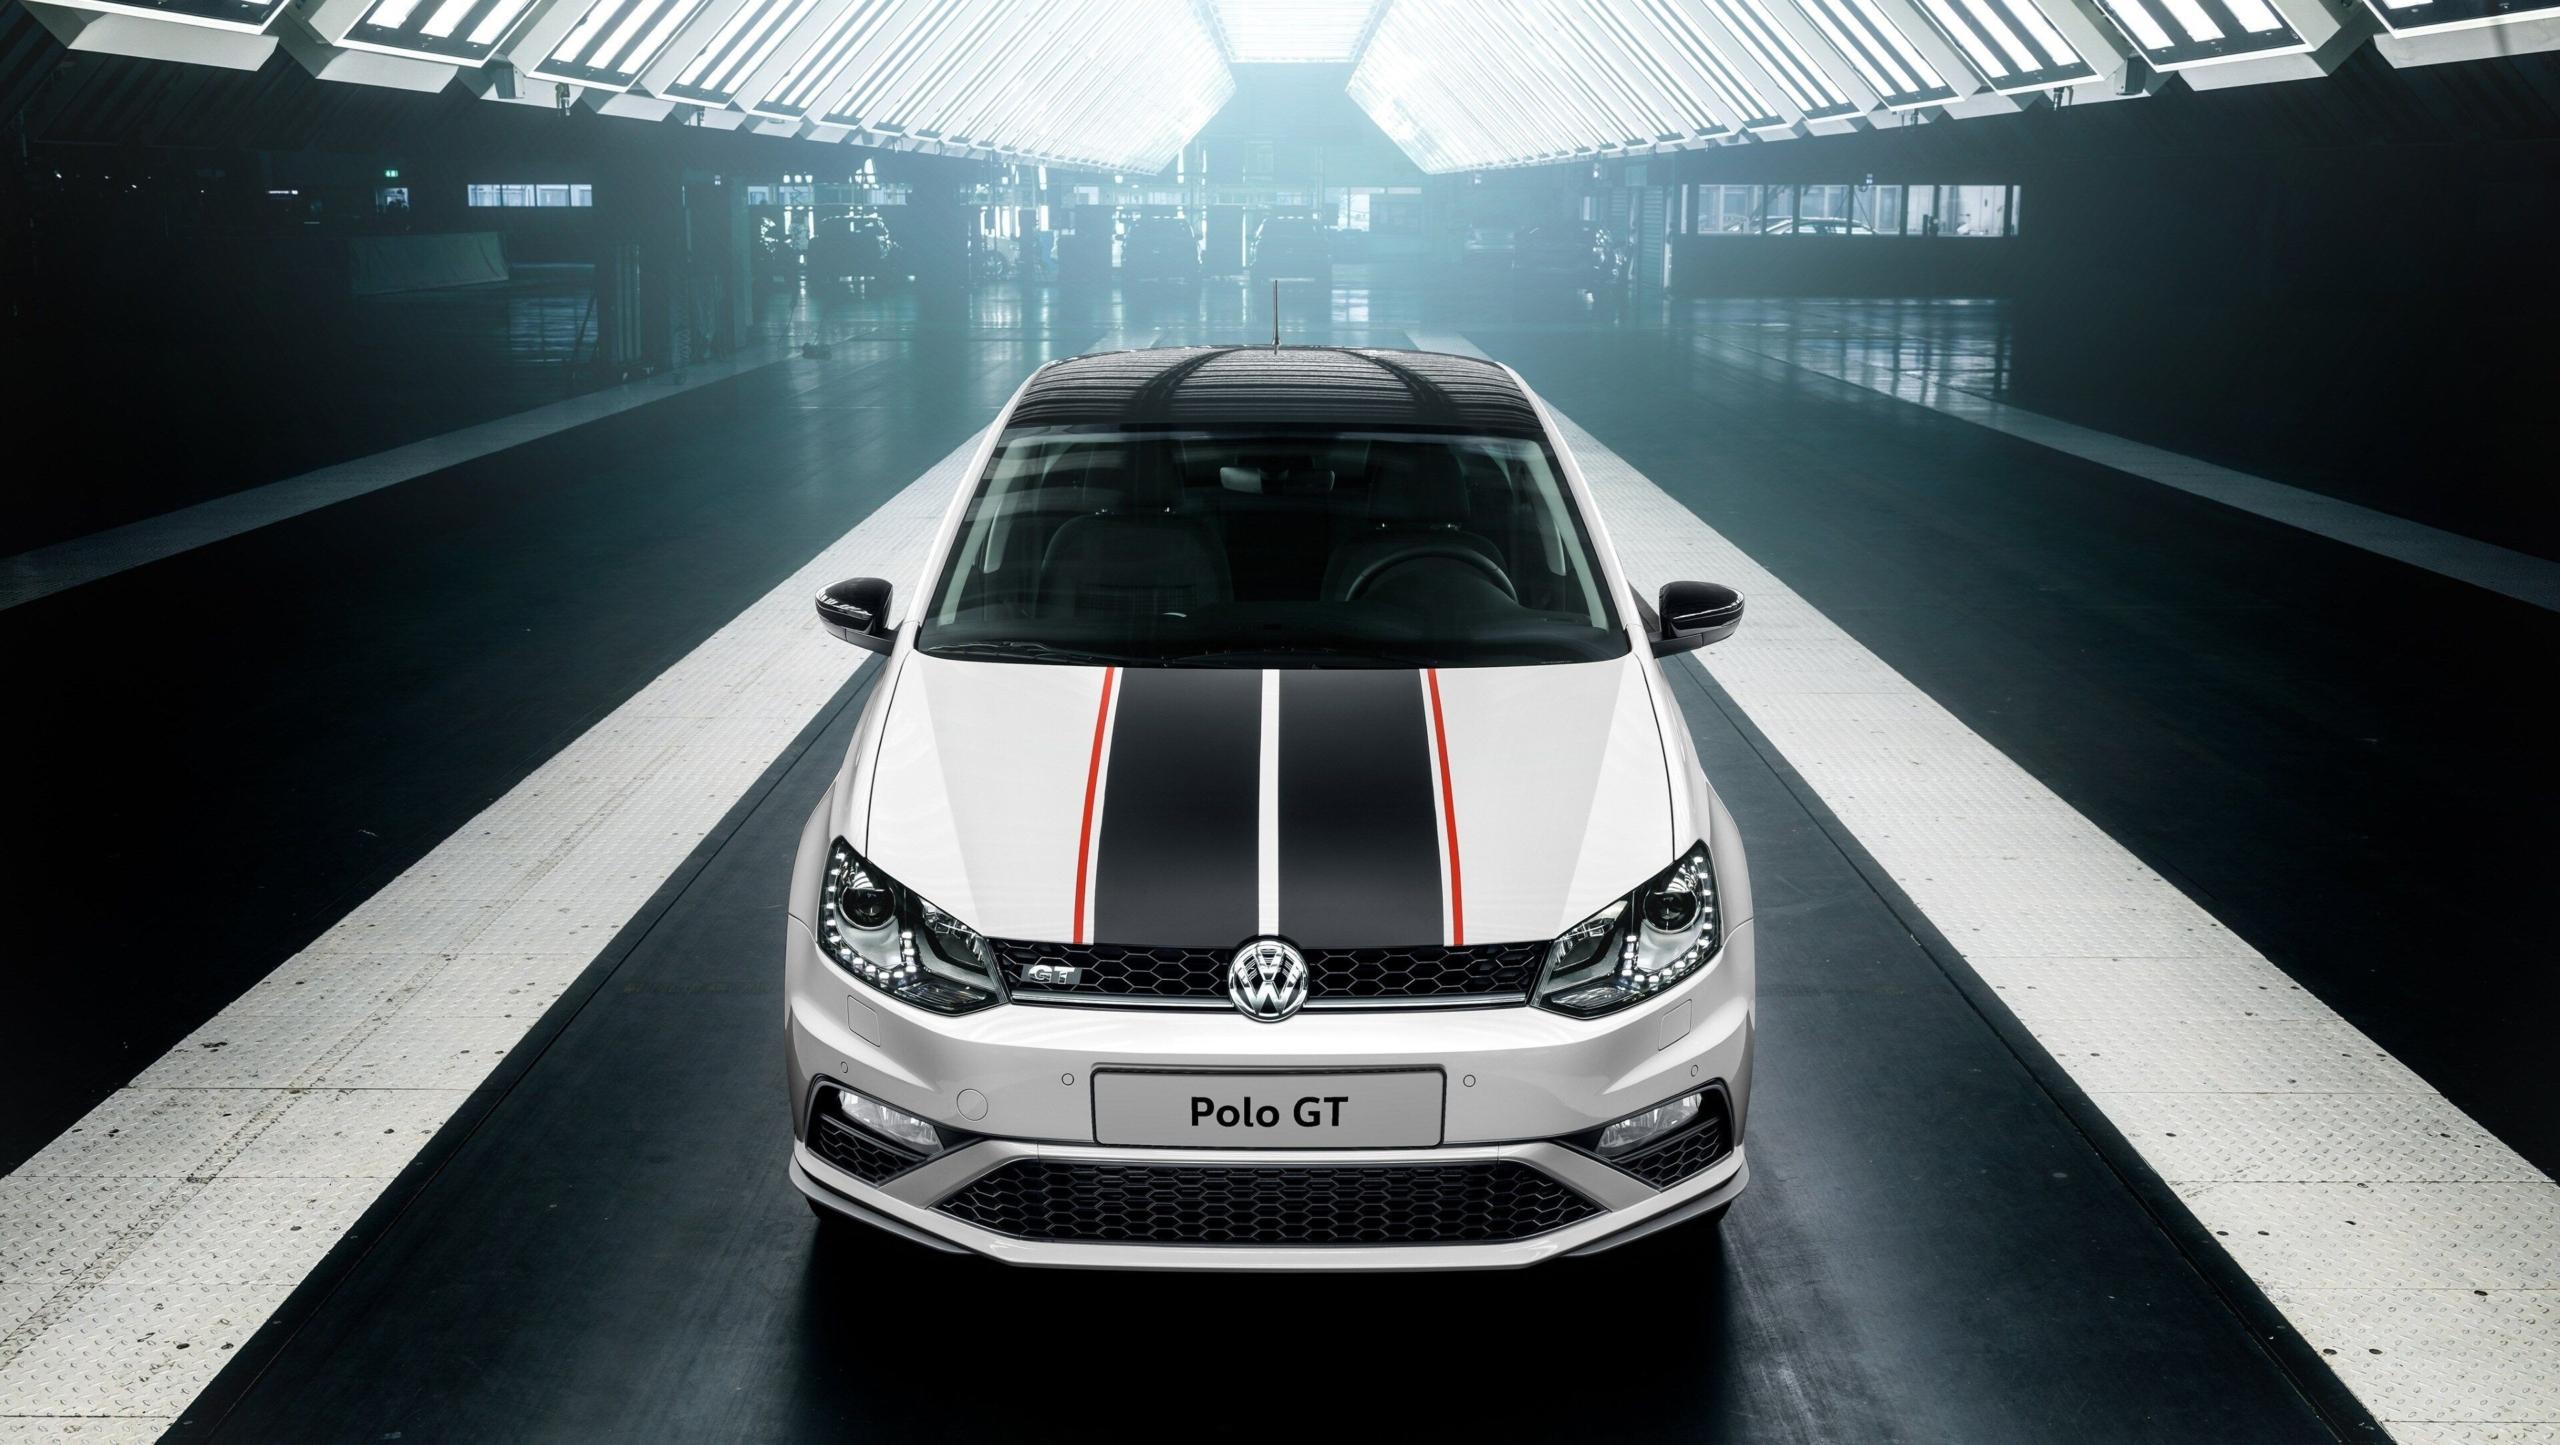 beautiful Polo Wallpaper designs